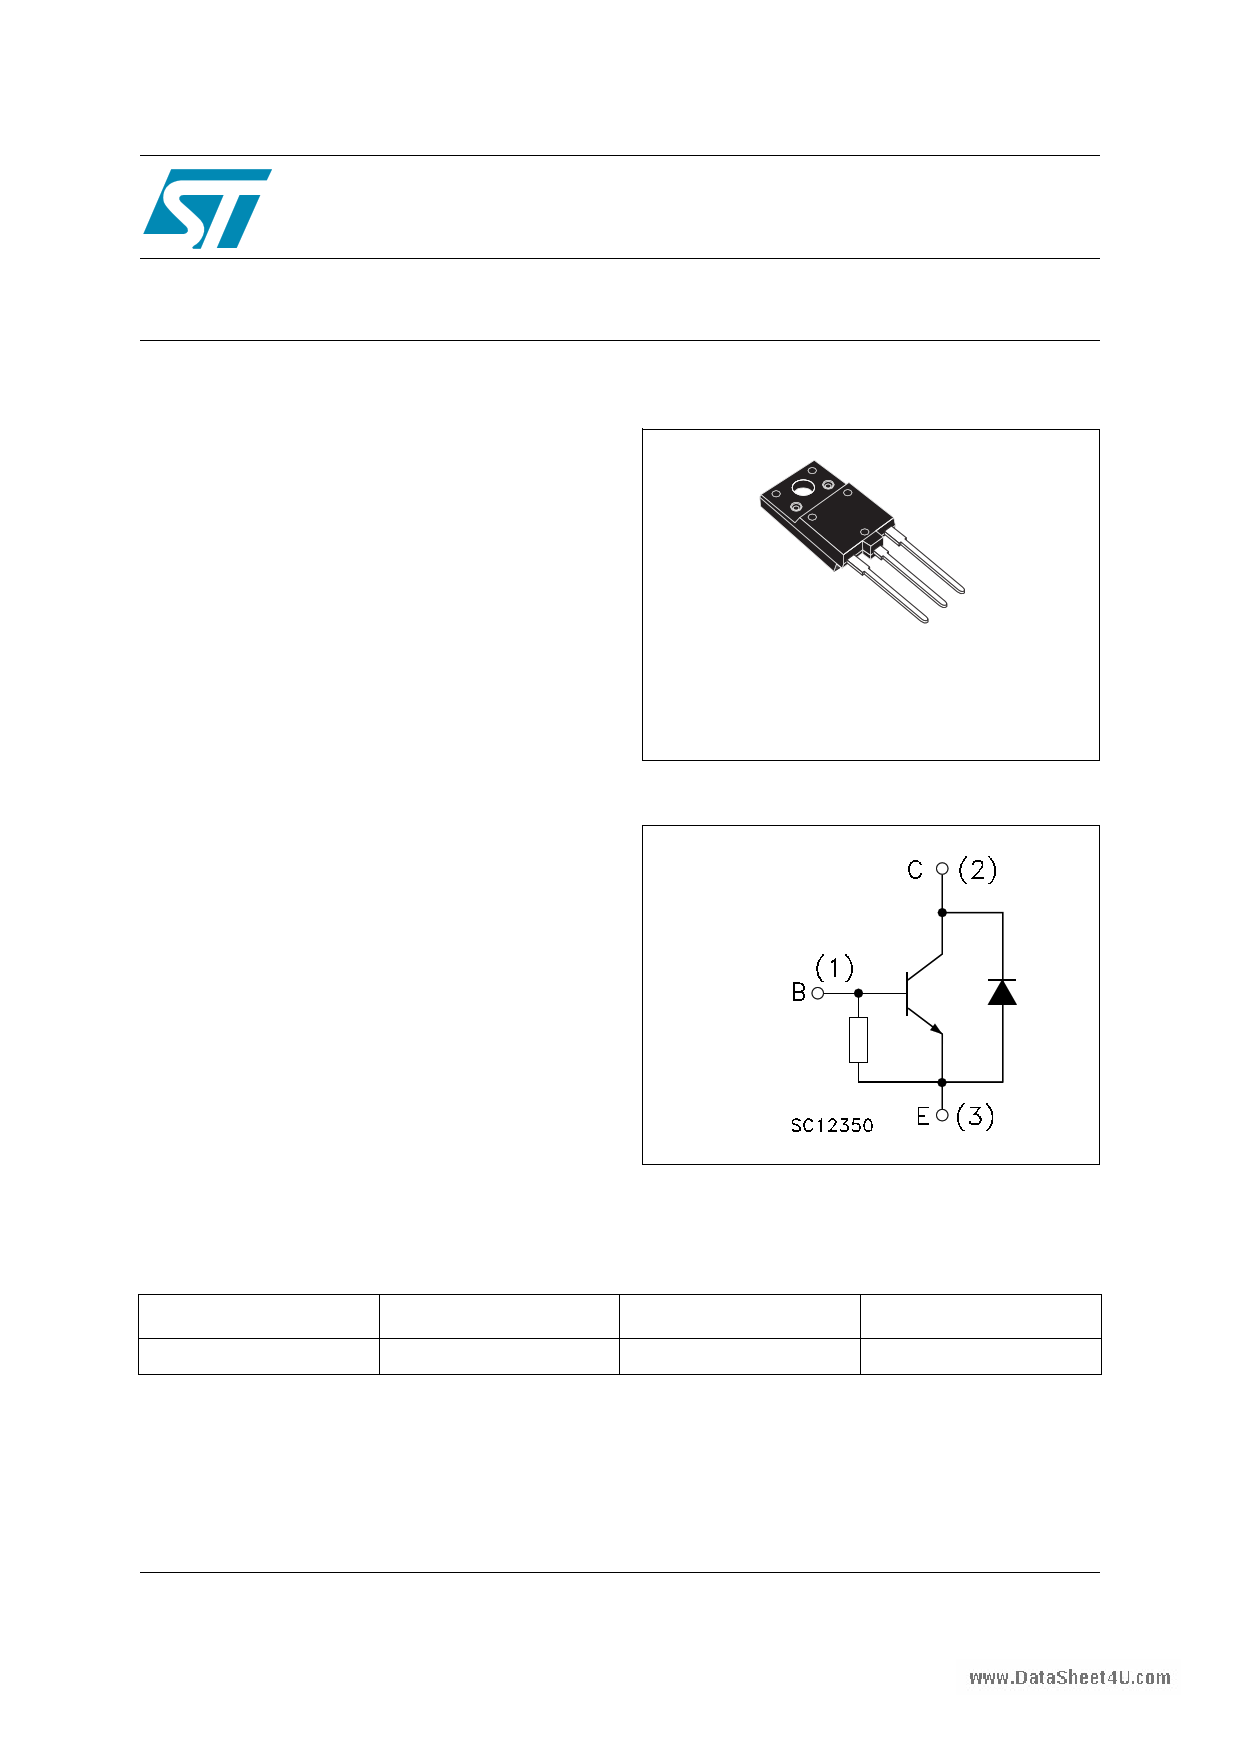 1803DFX datasheet image